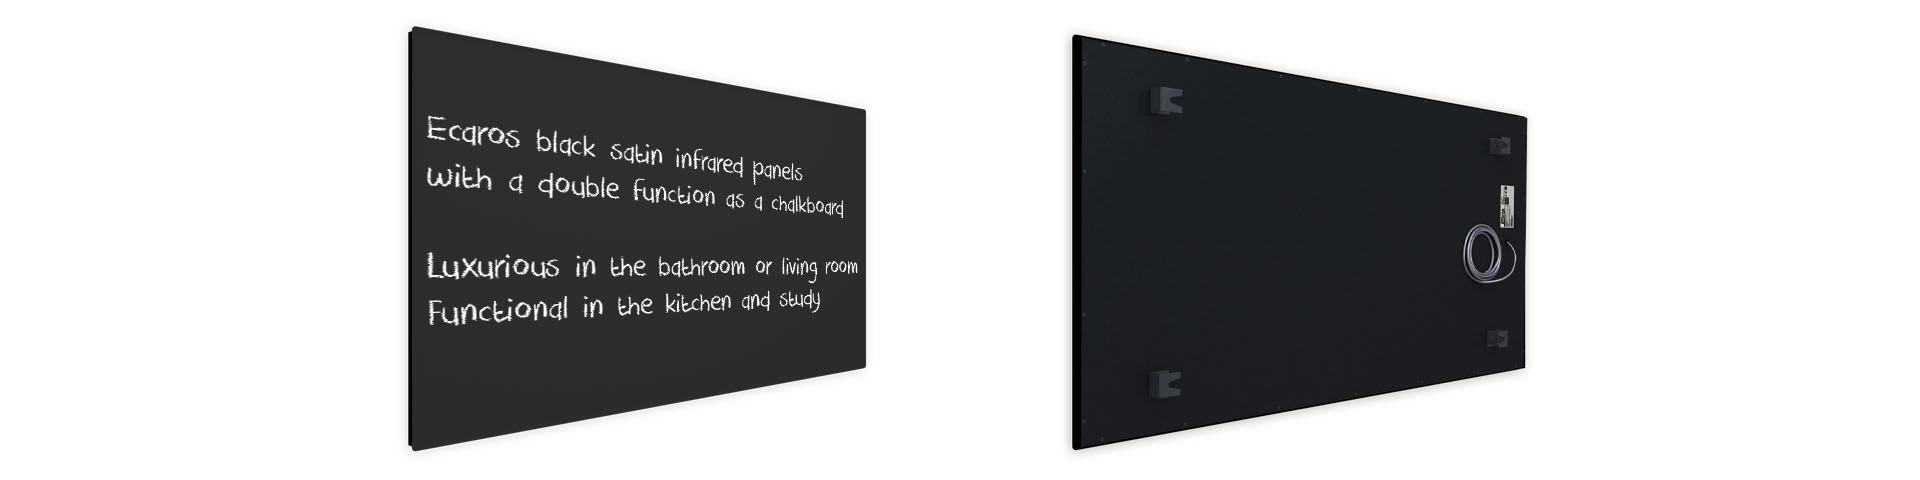 ecaros-black-slide-001